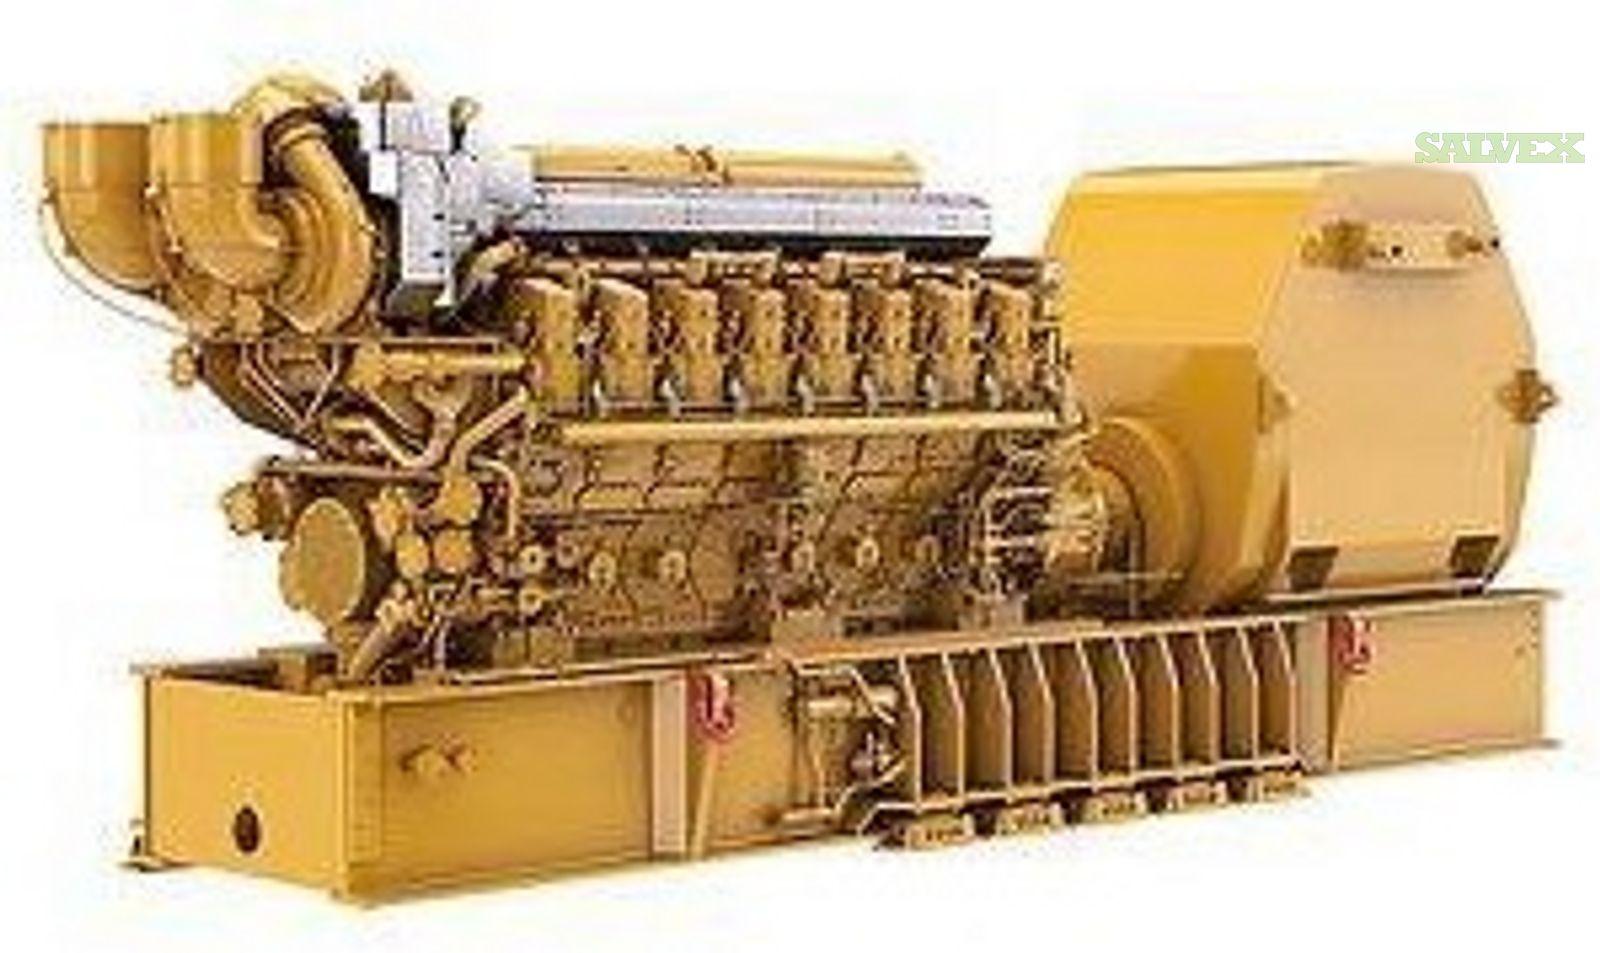 CAT C280-16 50Hz Offshore Generator Packages (5 Units)